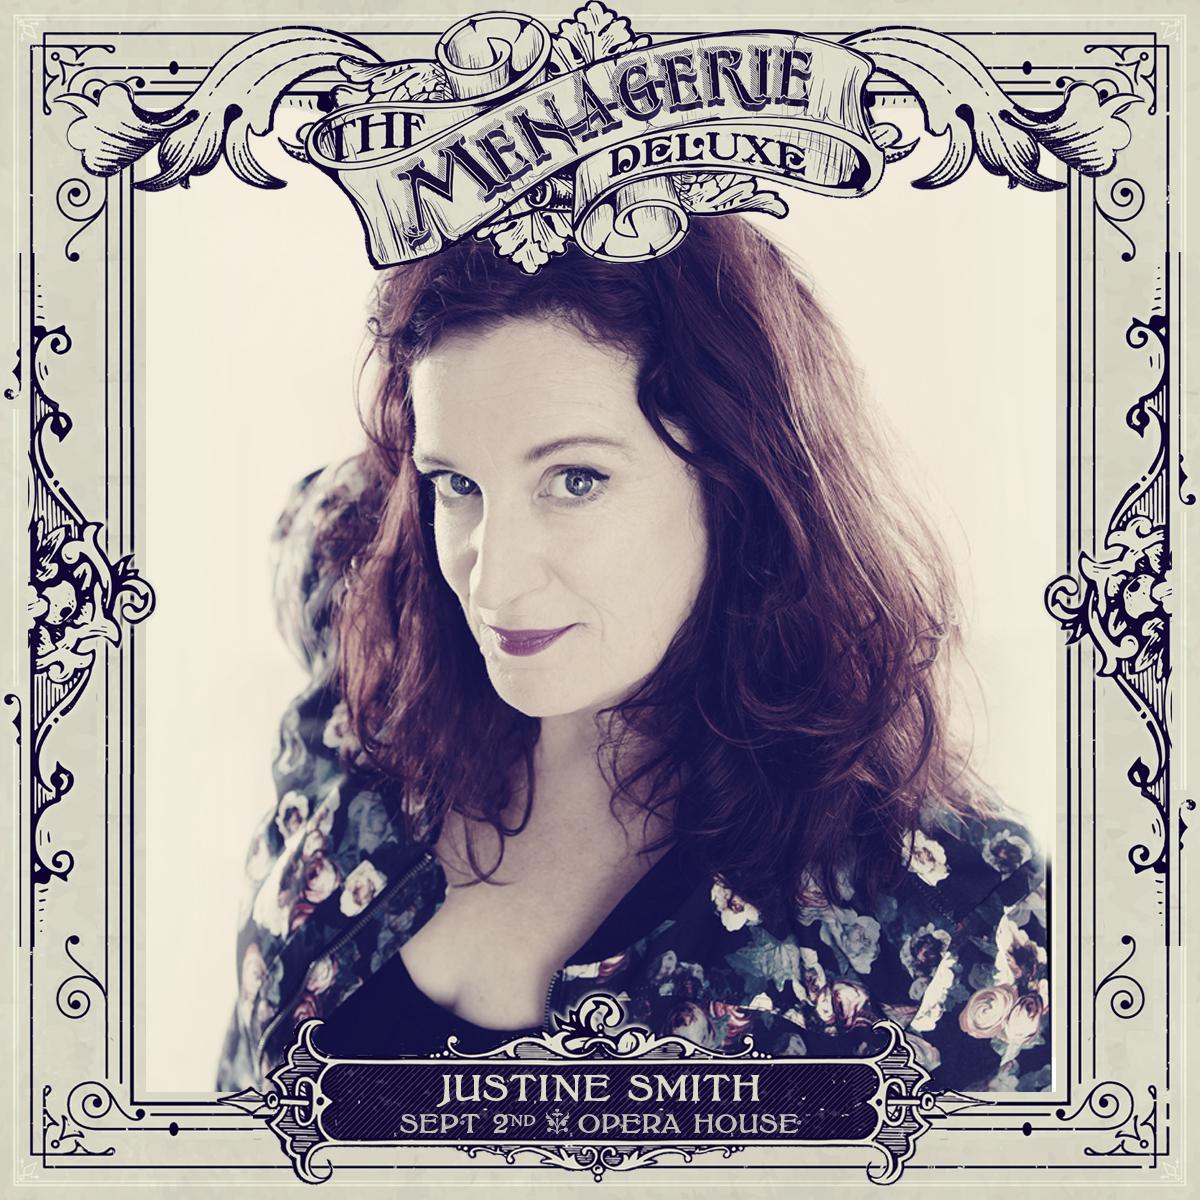 Justine Smith - Host